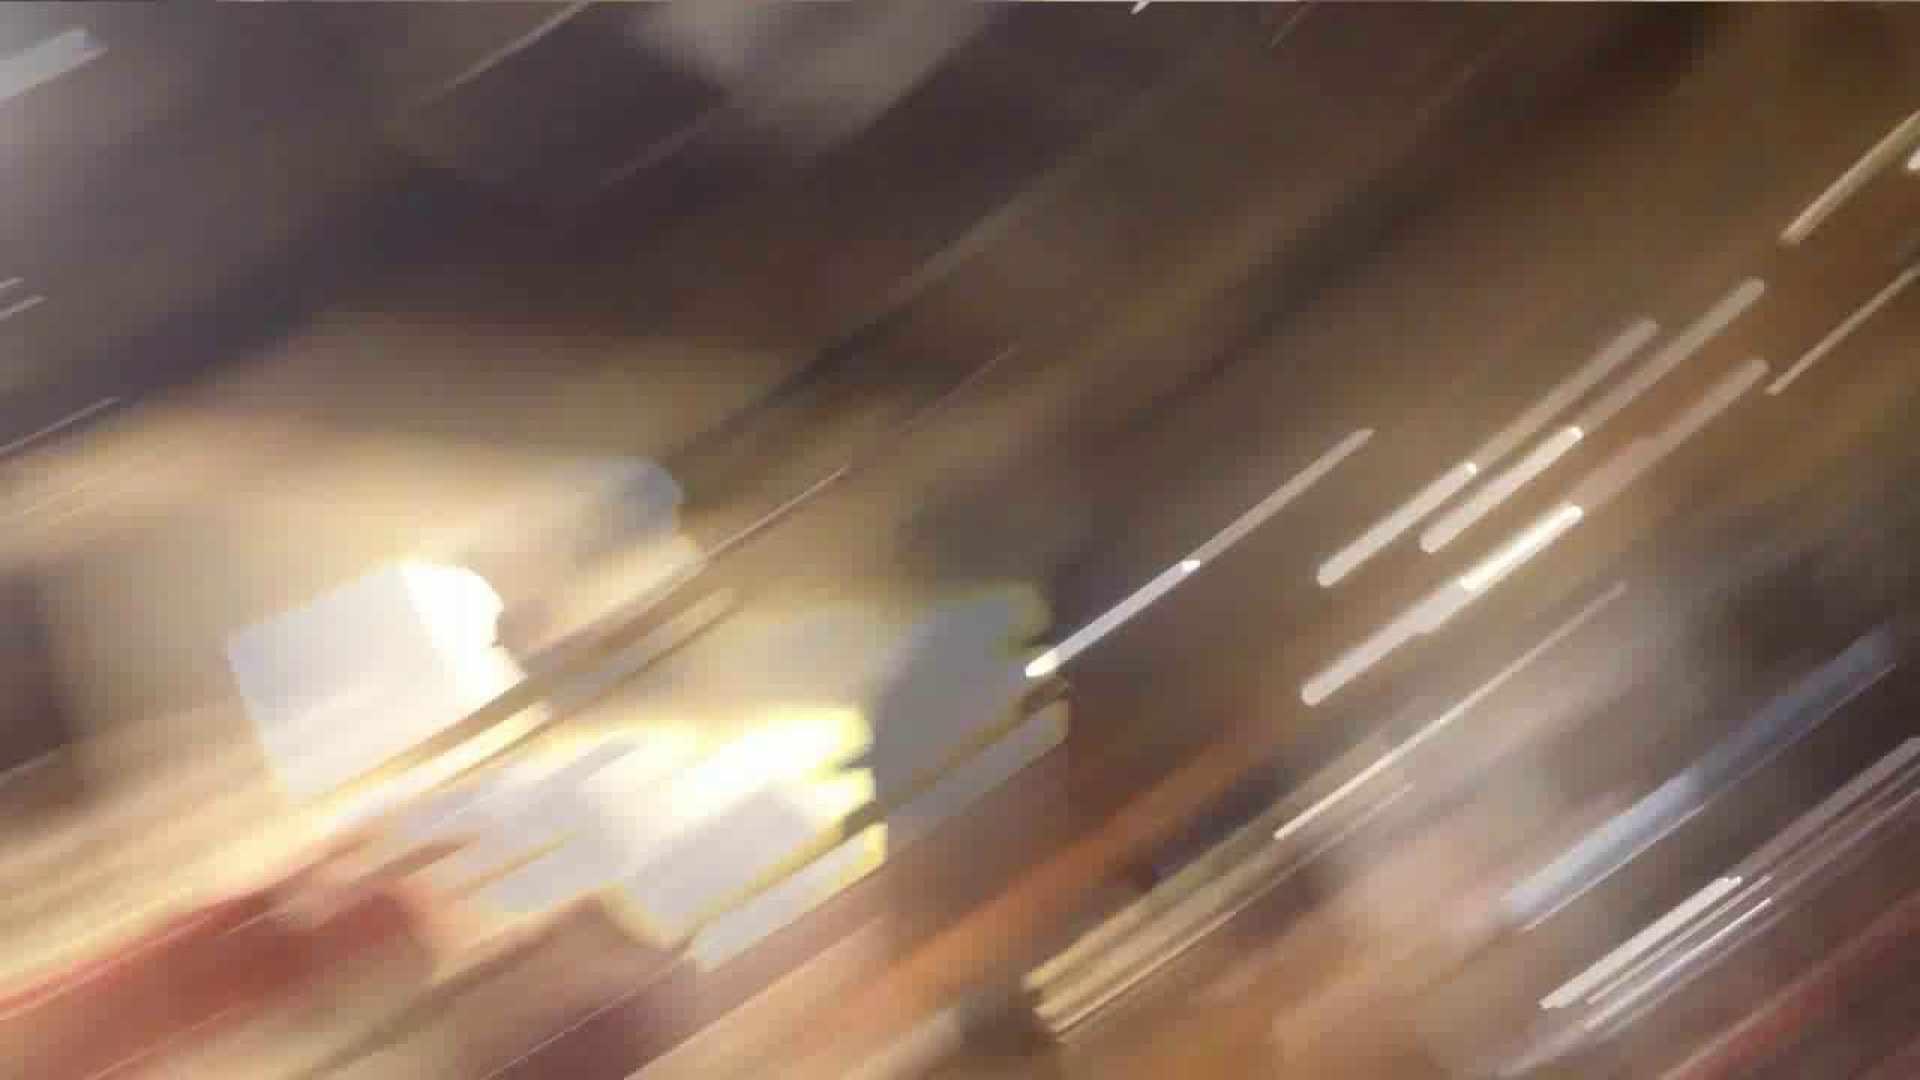 vol.34 美人アパレル胸チラ&パンチラ メガネ属性っていいよね♥ パンチラ 濡れ場動画紹介 66PICs 52